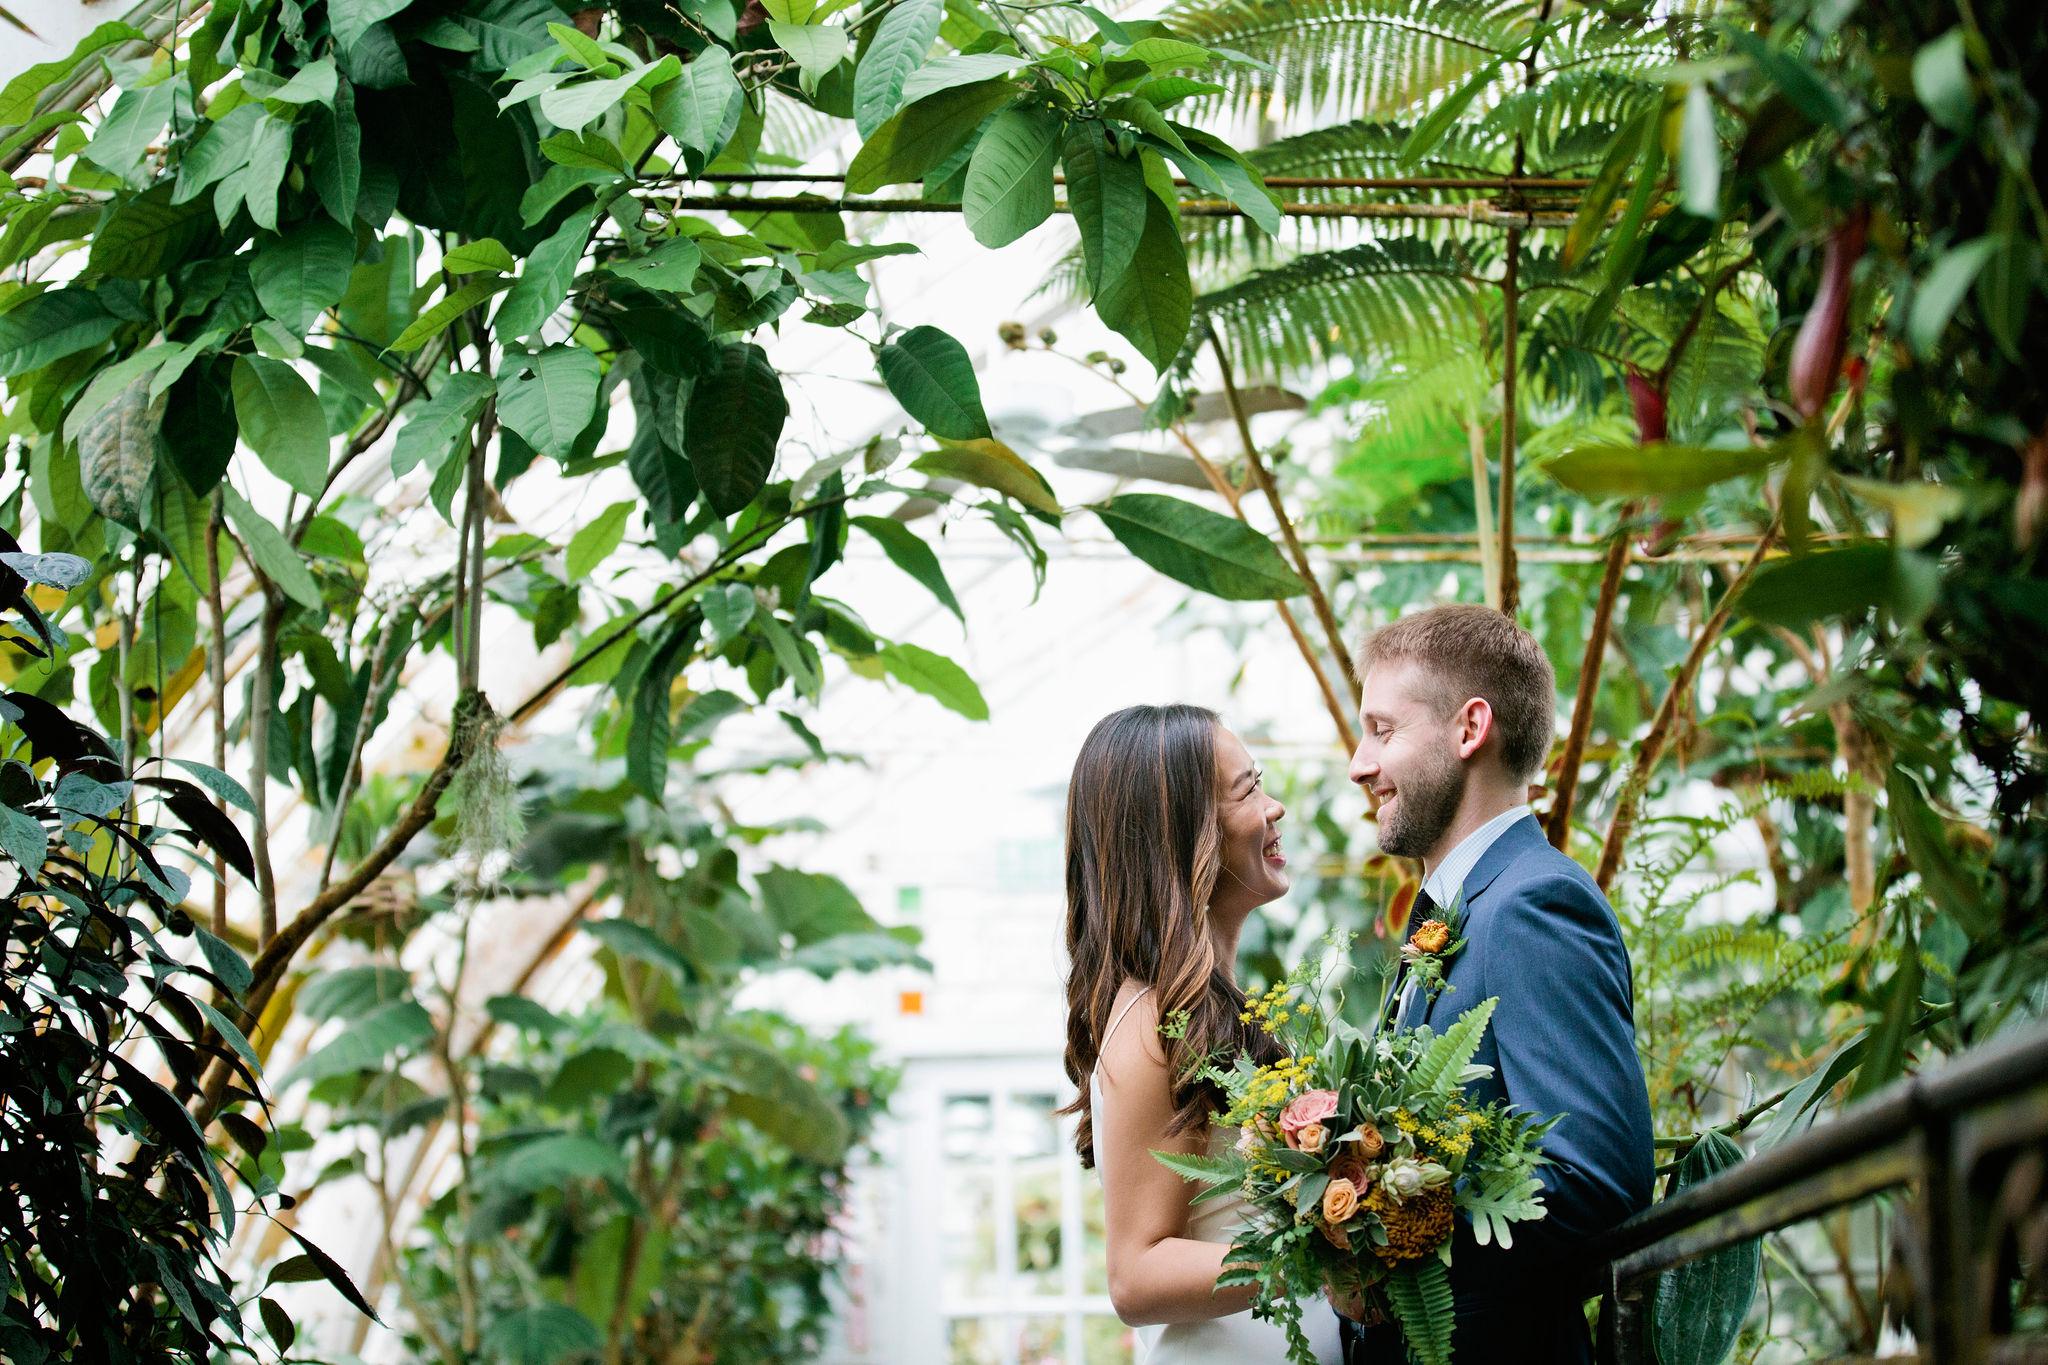 Conservatory-of-Flowers-Wedding-13.JPG